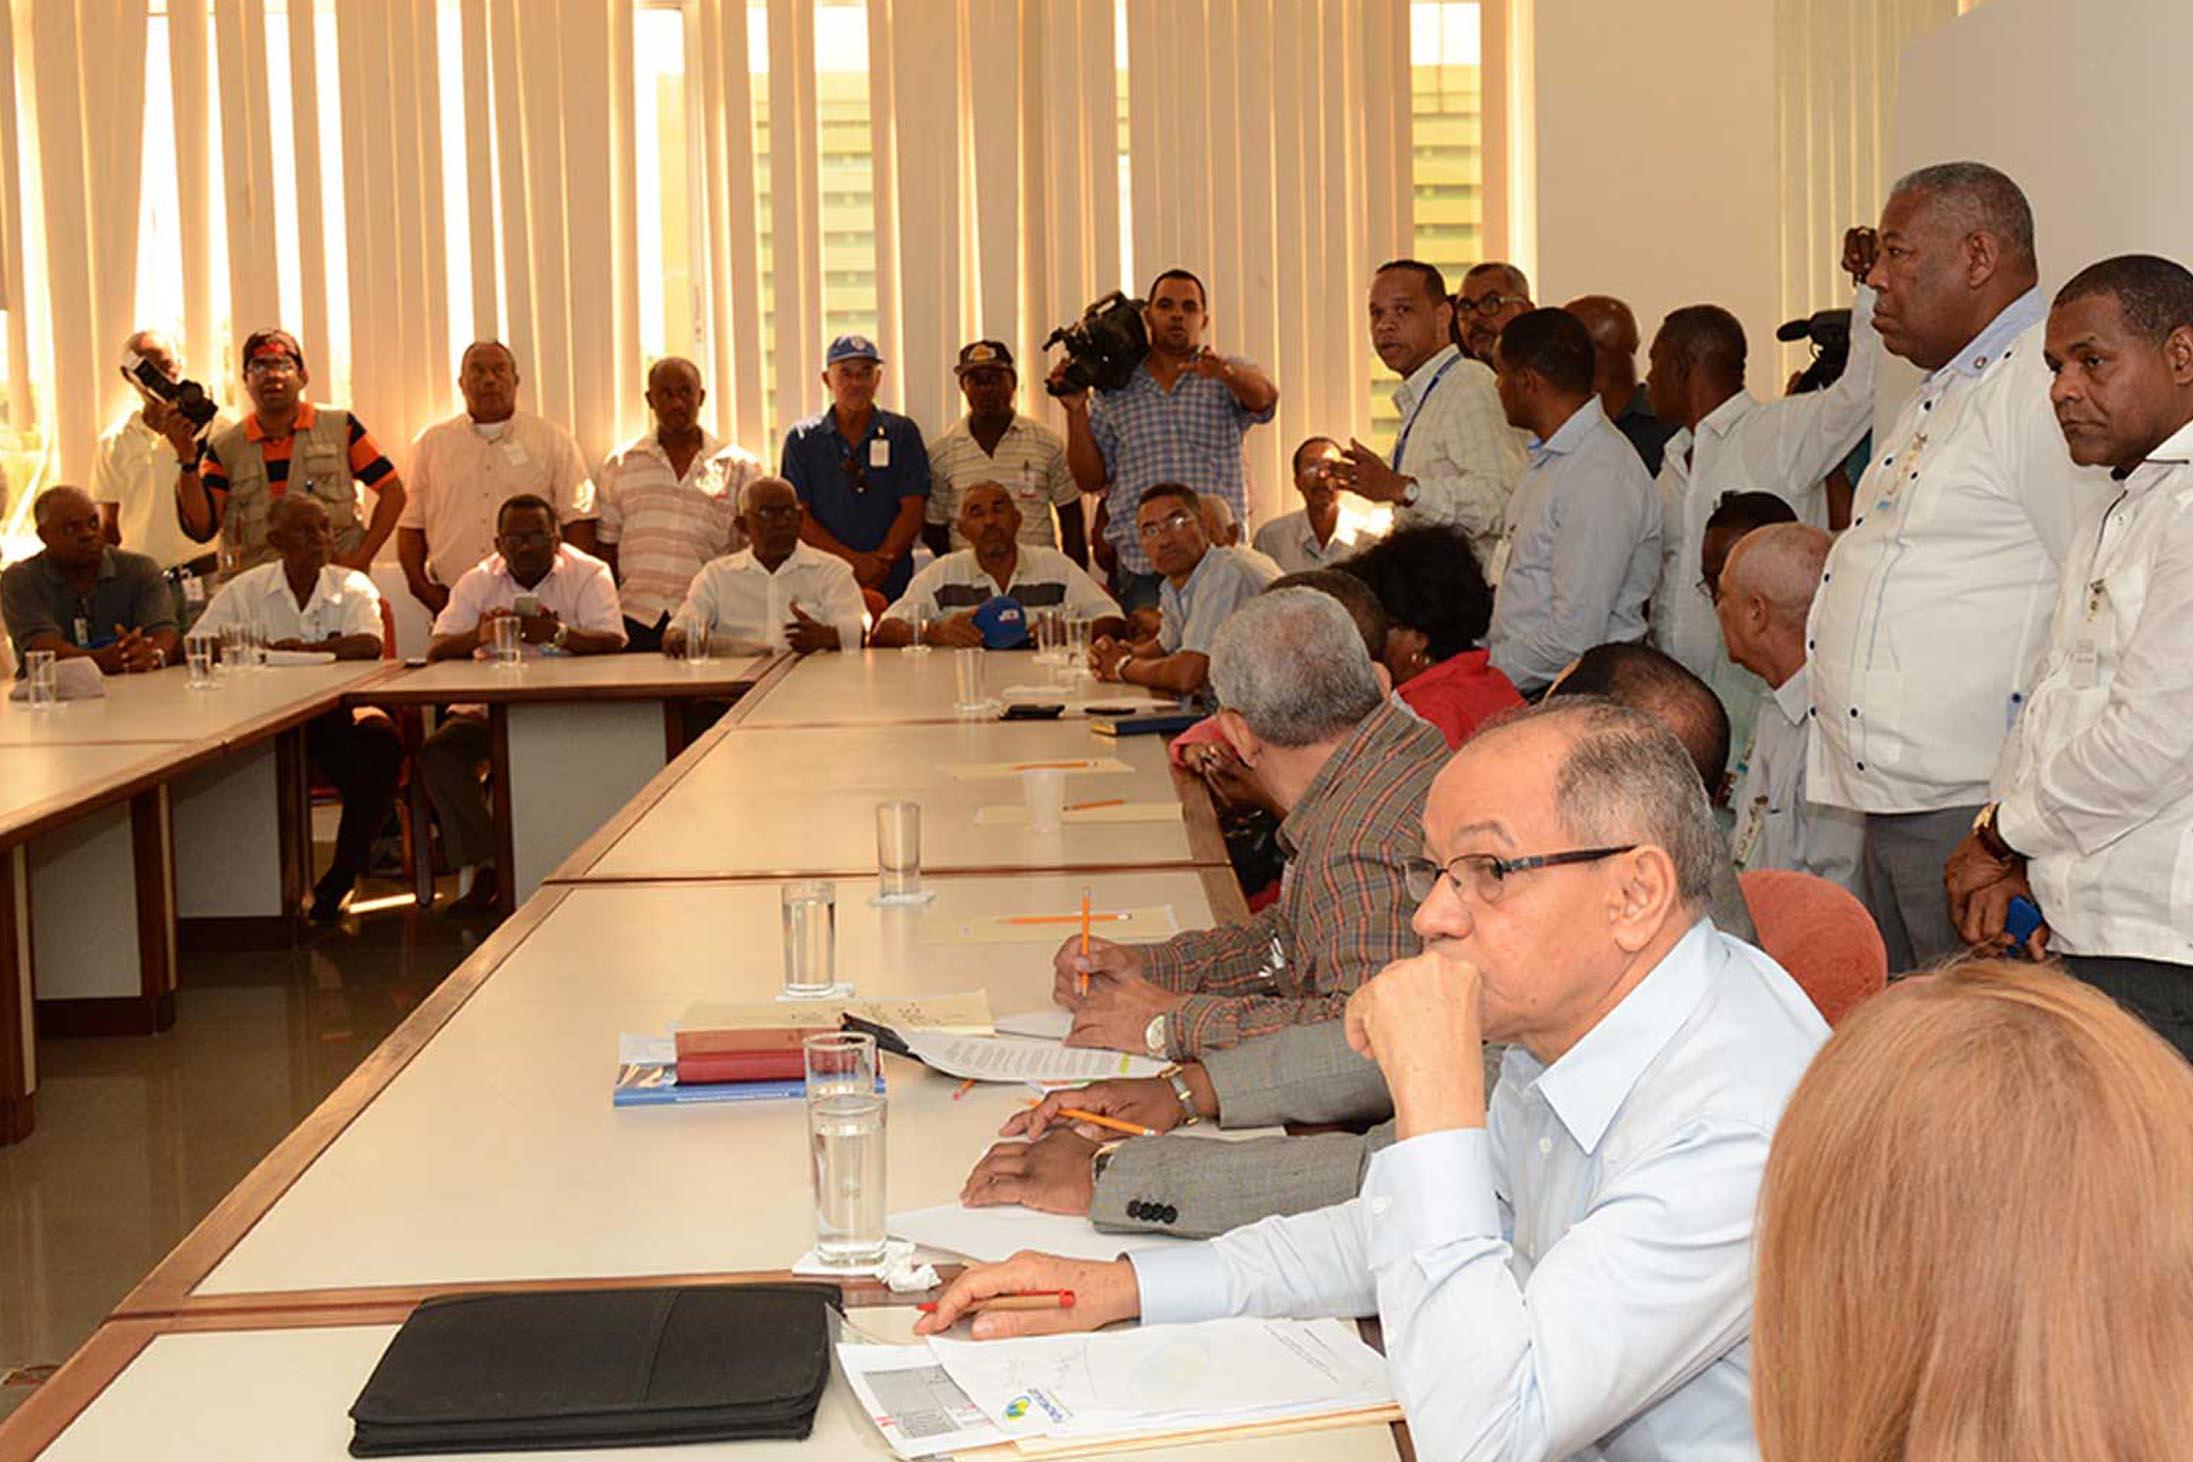 Patronos piden rediscutir tarifa aprobada por Comité Nacional de Salarios